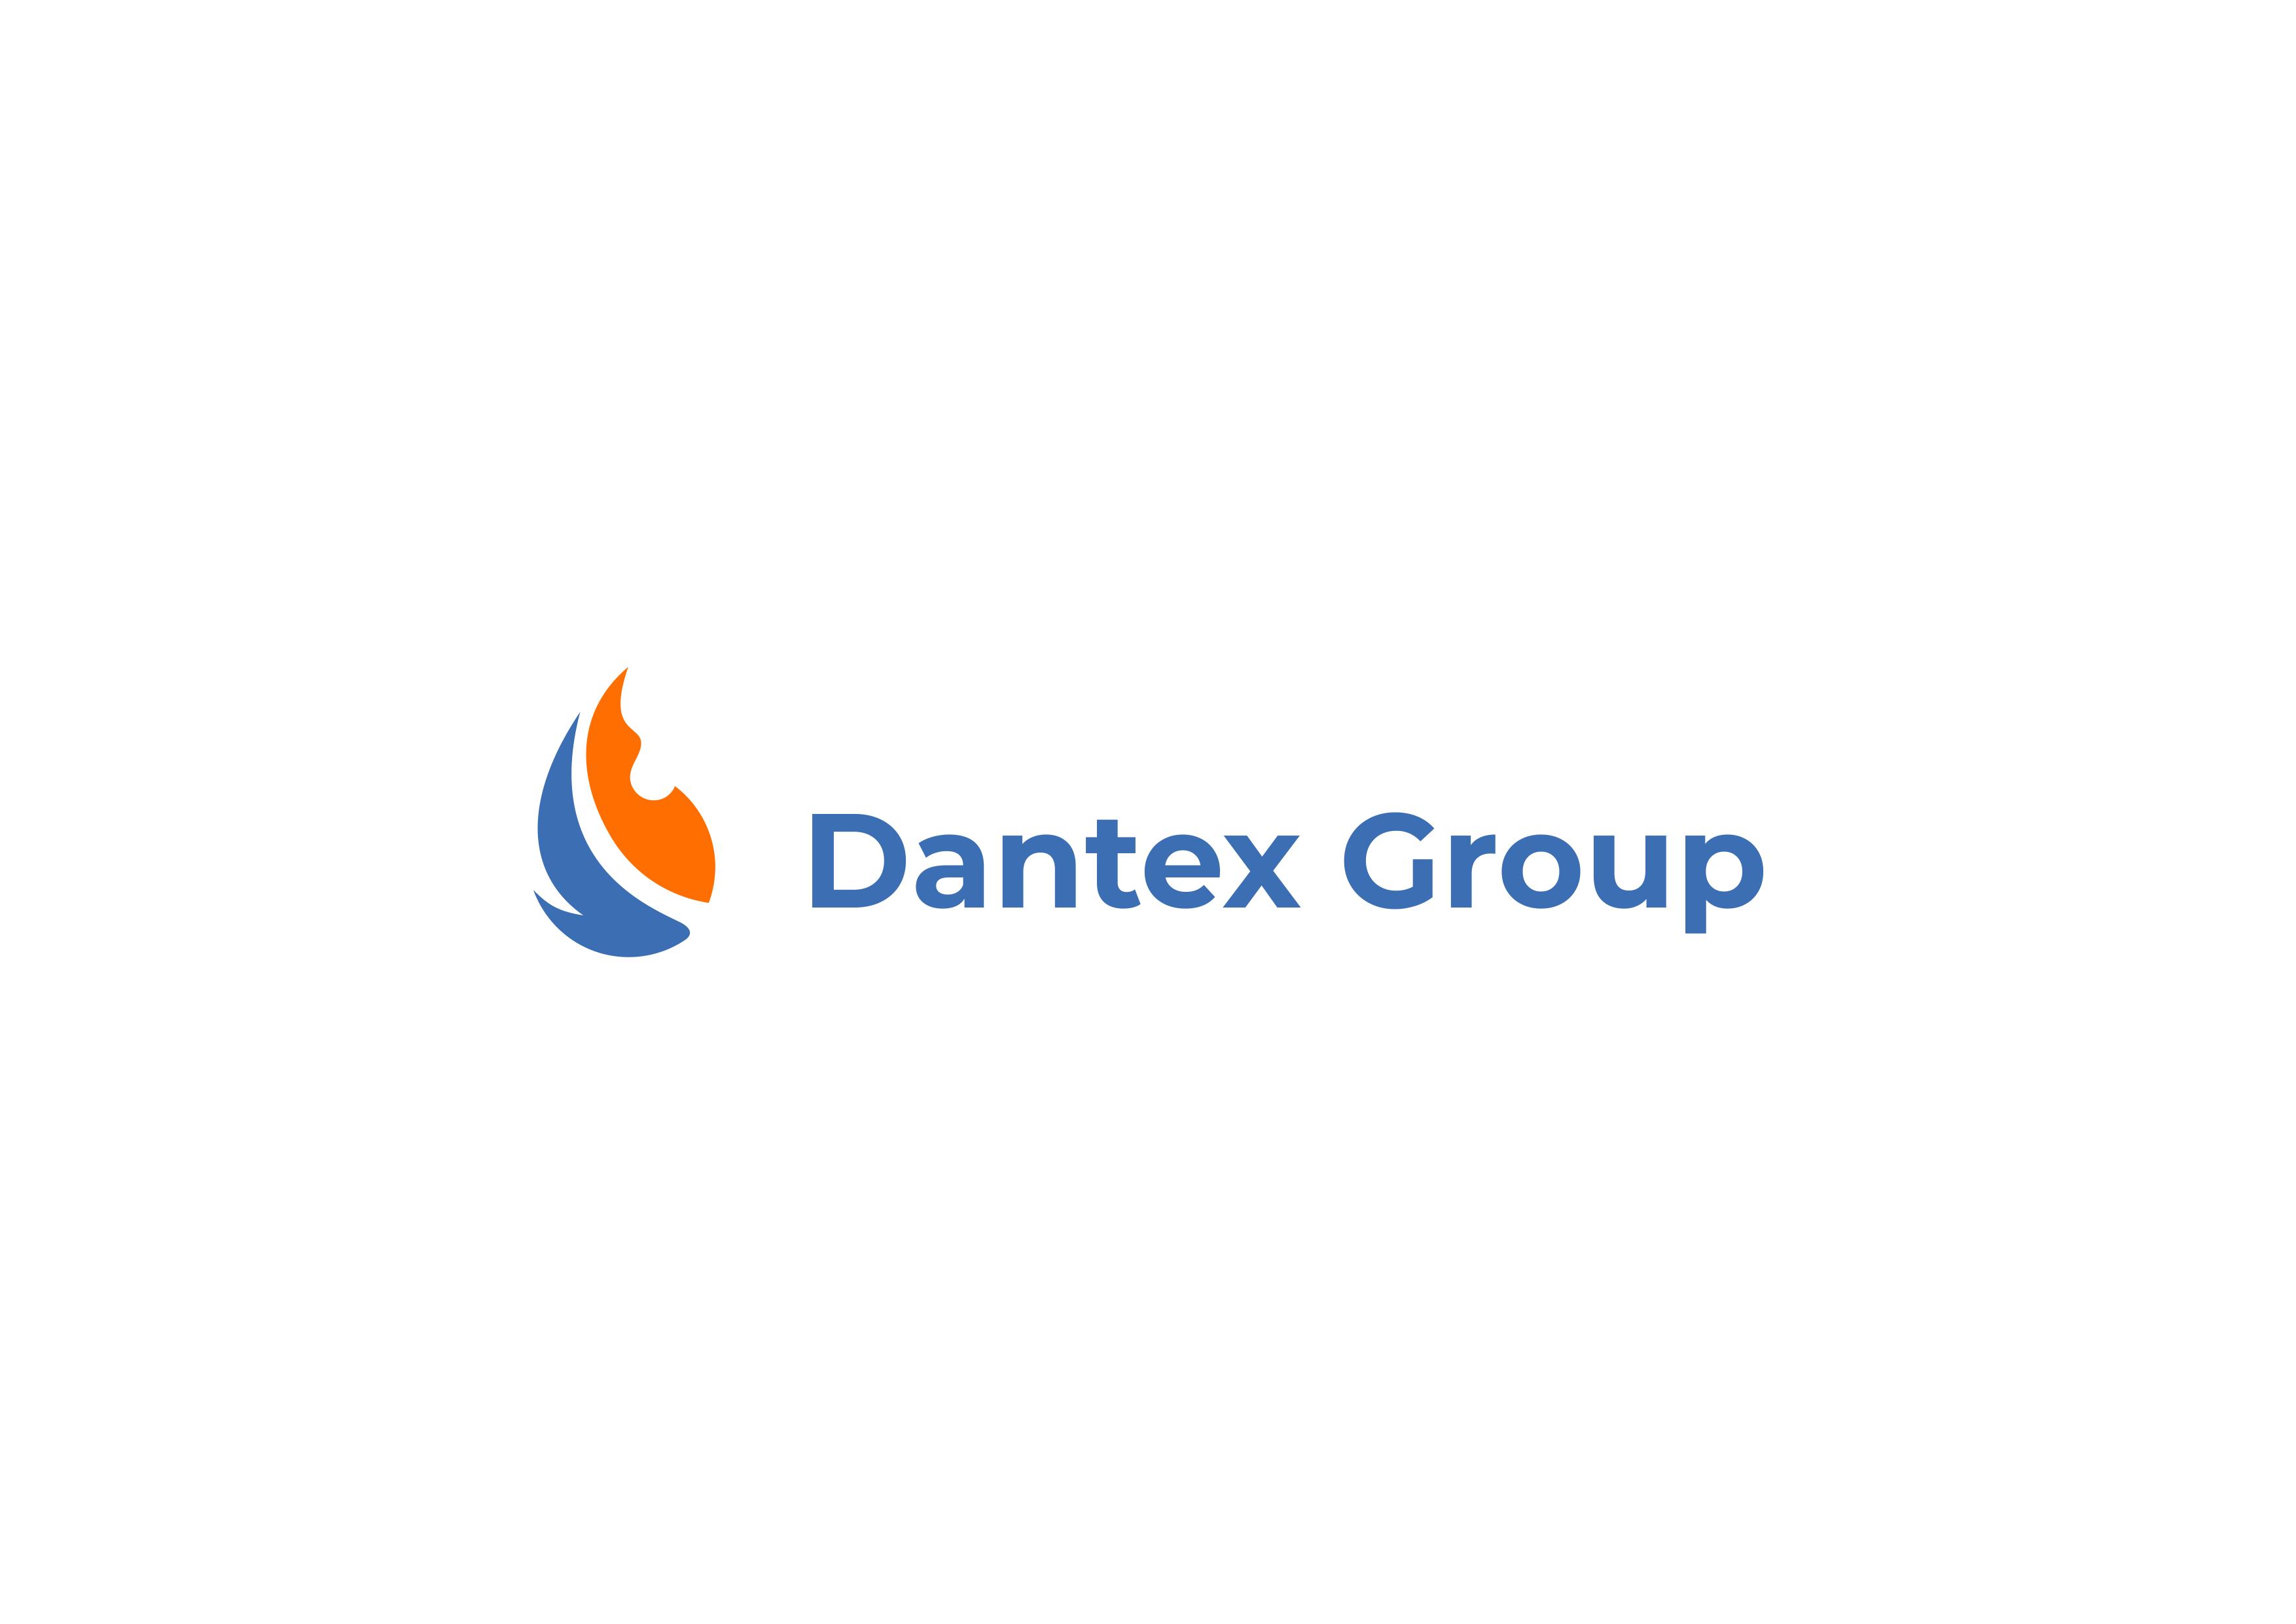 Конкурс на разработку логотипа для компании Dantex Group  фото f_8135bff89c7bbb45.png